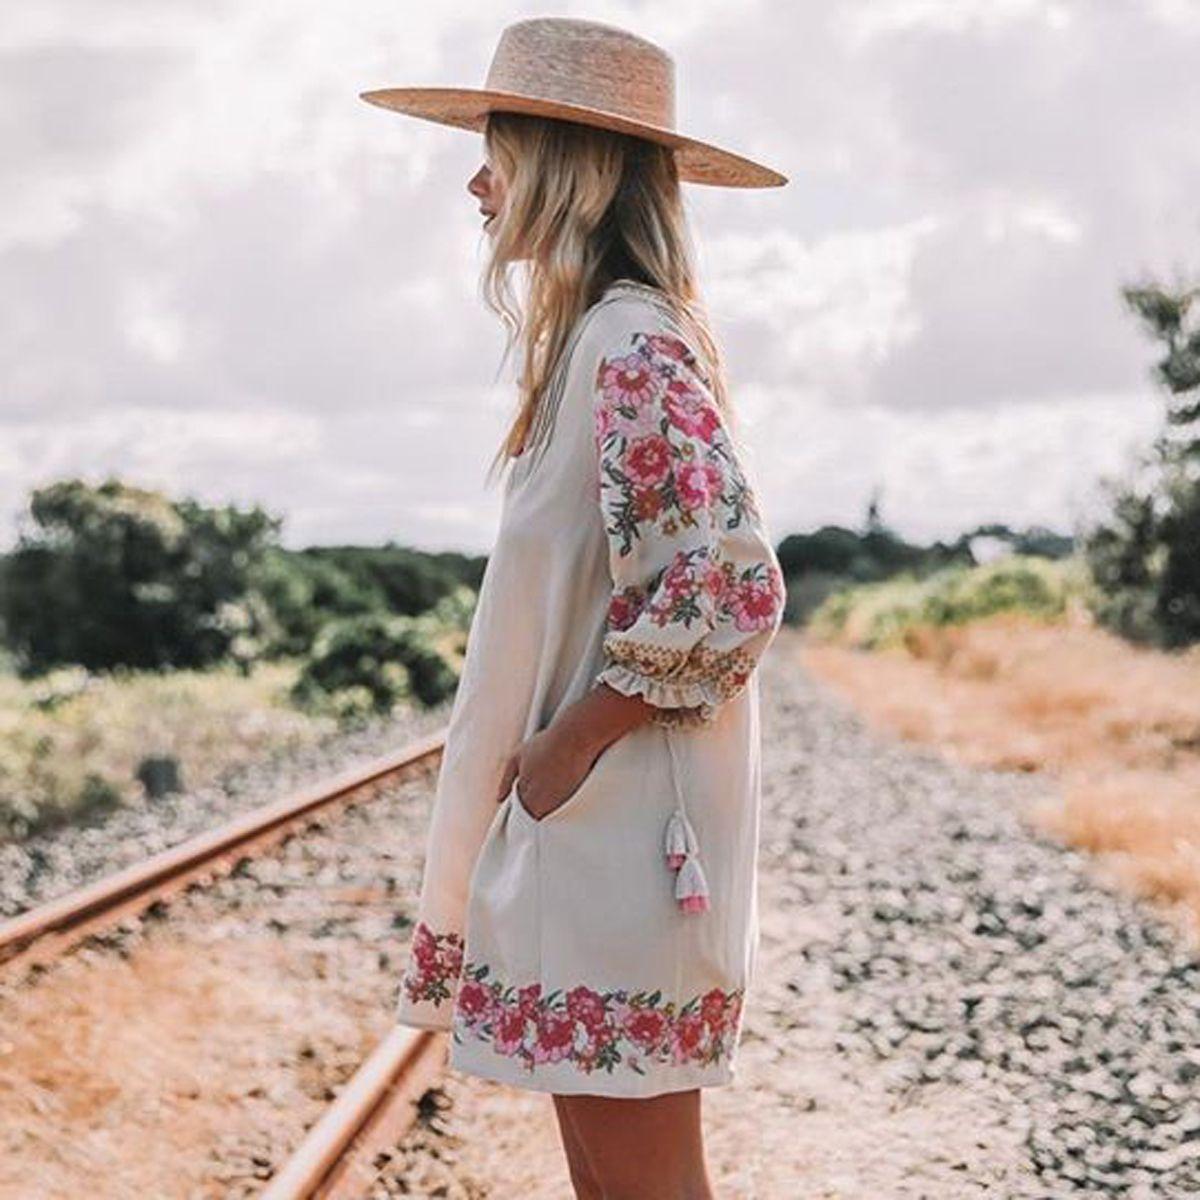 cbb844a8cfb9e Jastie Embroidered Floral Tunic 2018 Spring Summer Dresses Lantern Sleeve  V-neck Tassel Boho Hippie Beach Dress Vestidos Q190521